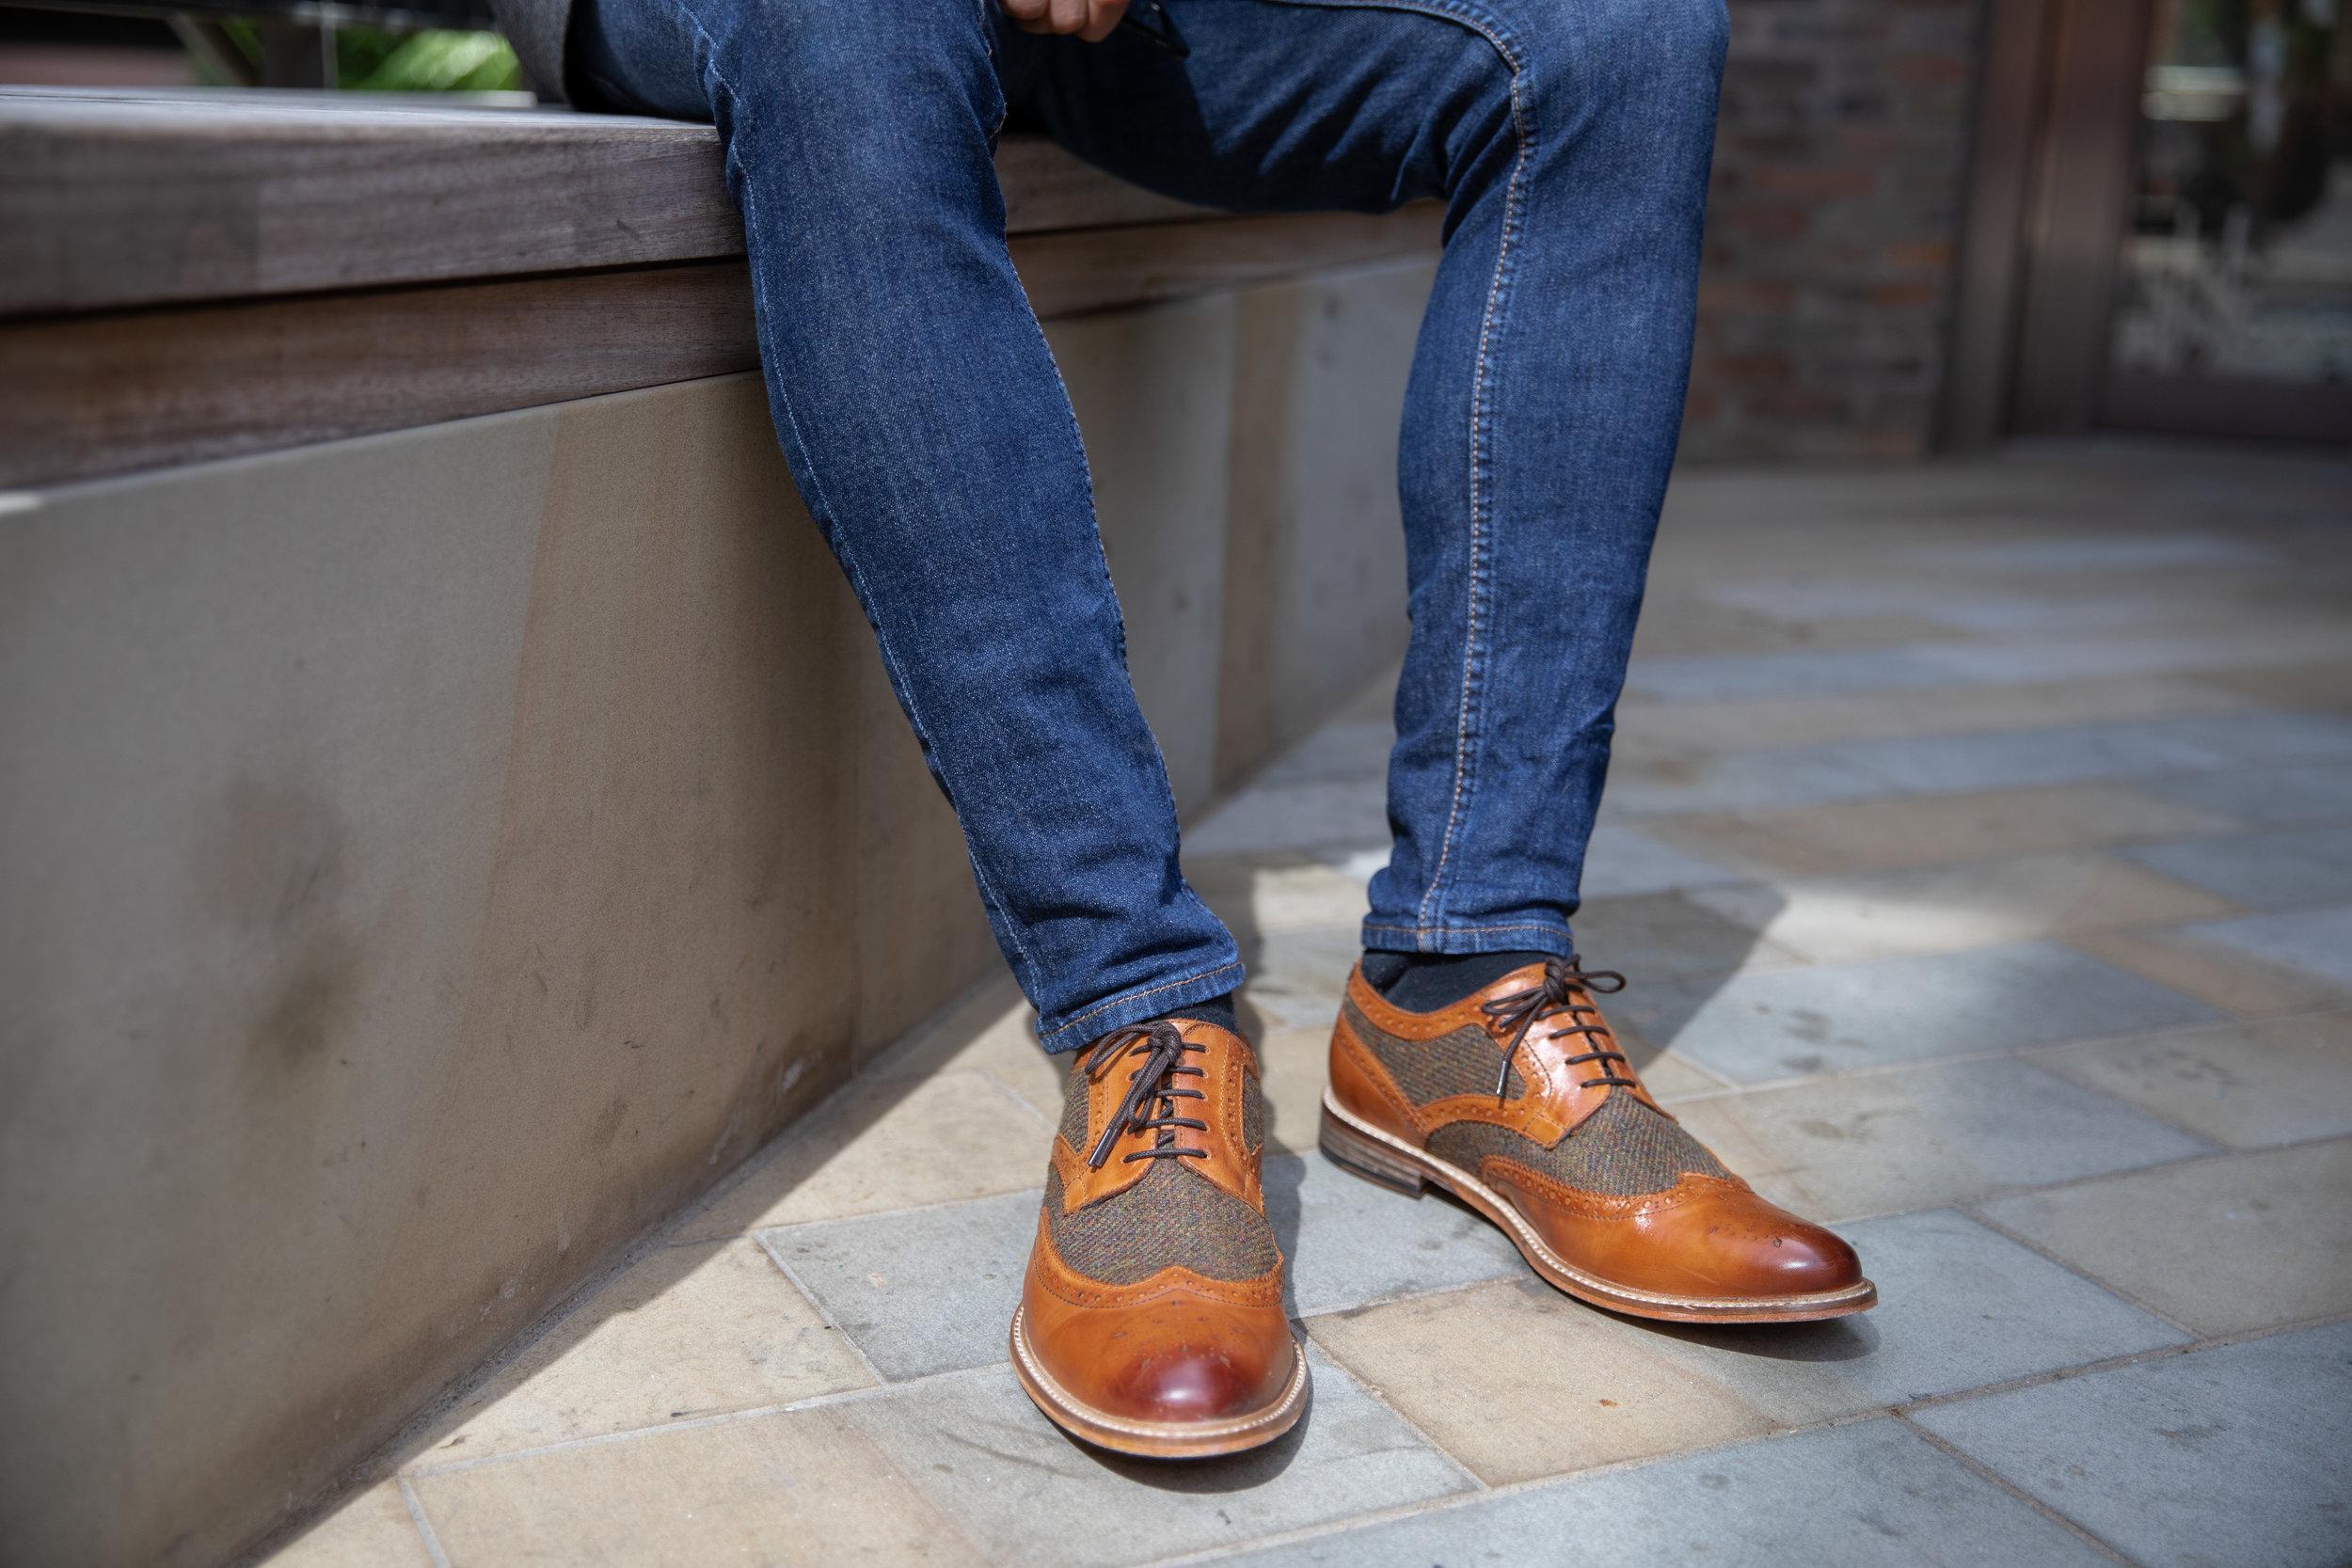 LANX Shoes 5.jpg